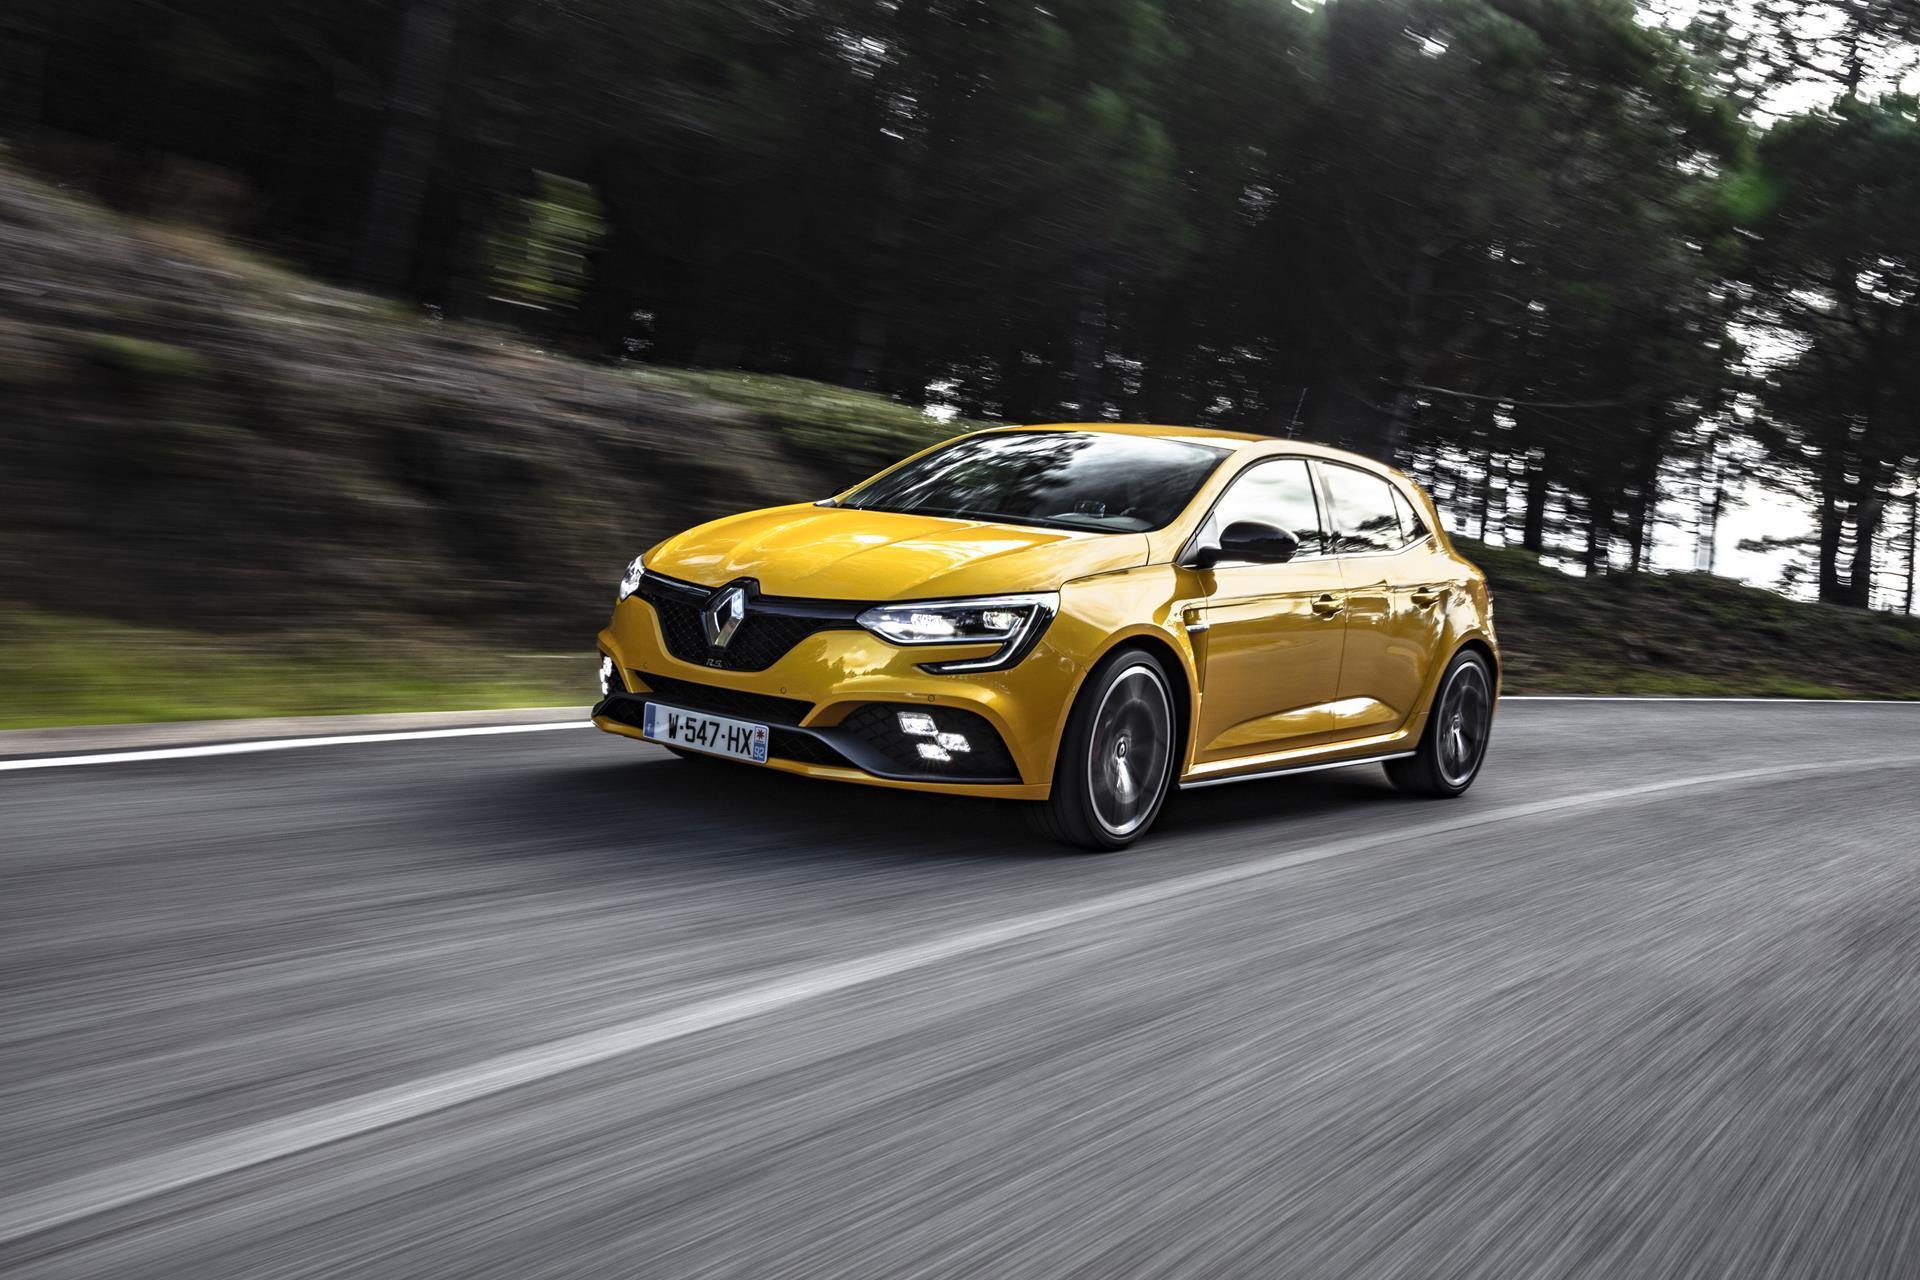 2019 Renault Megane R S 300 Trophy News And Information